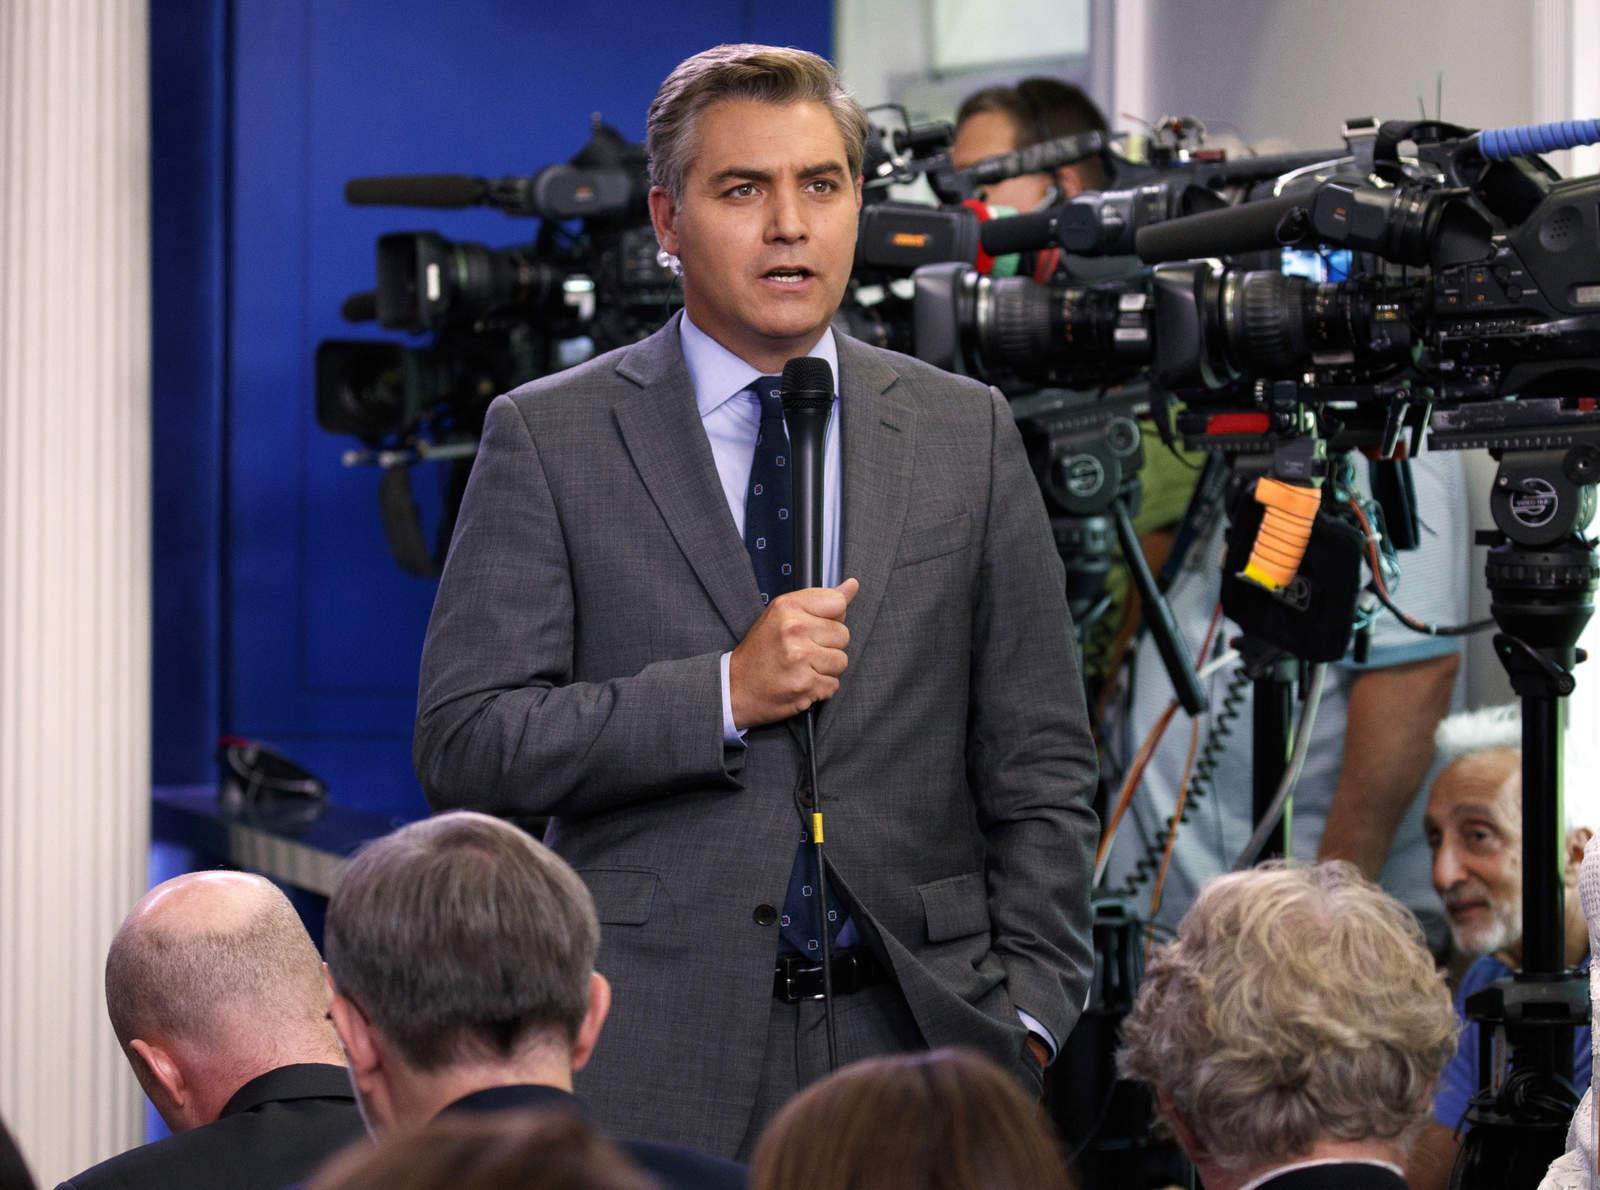 Casa Blanca suspende a reportero por confrontar a Trump